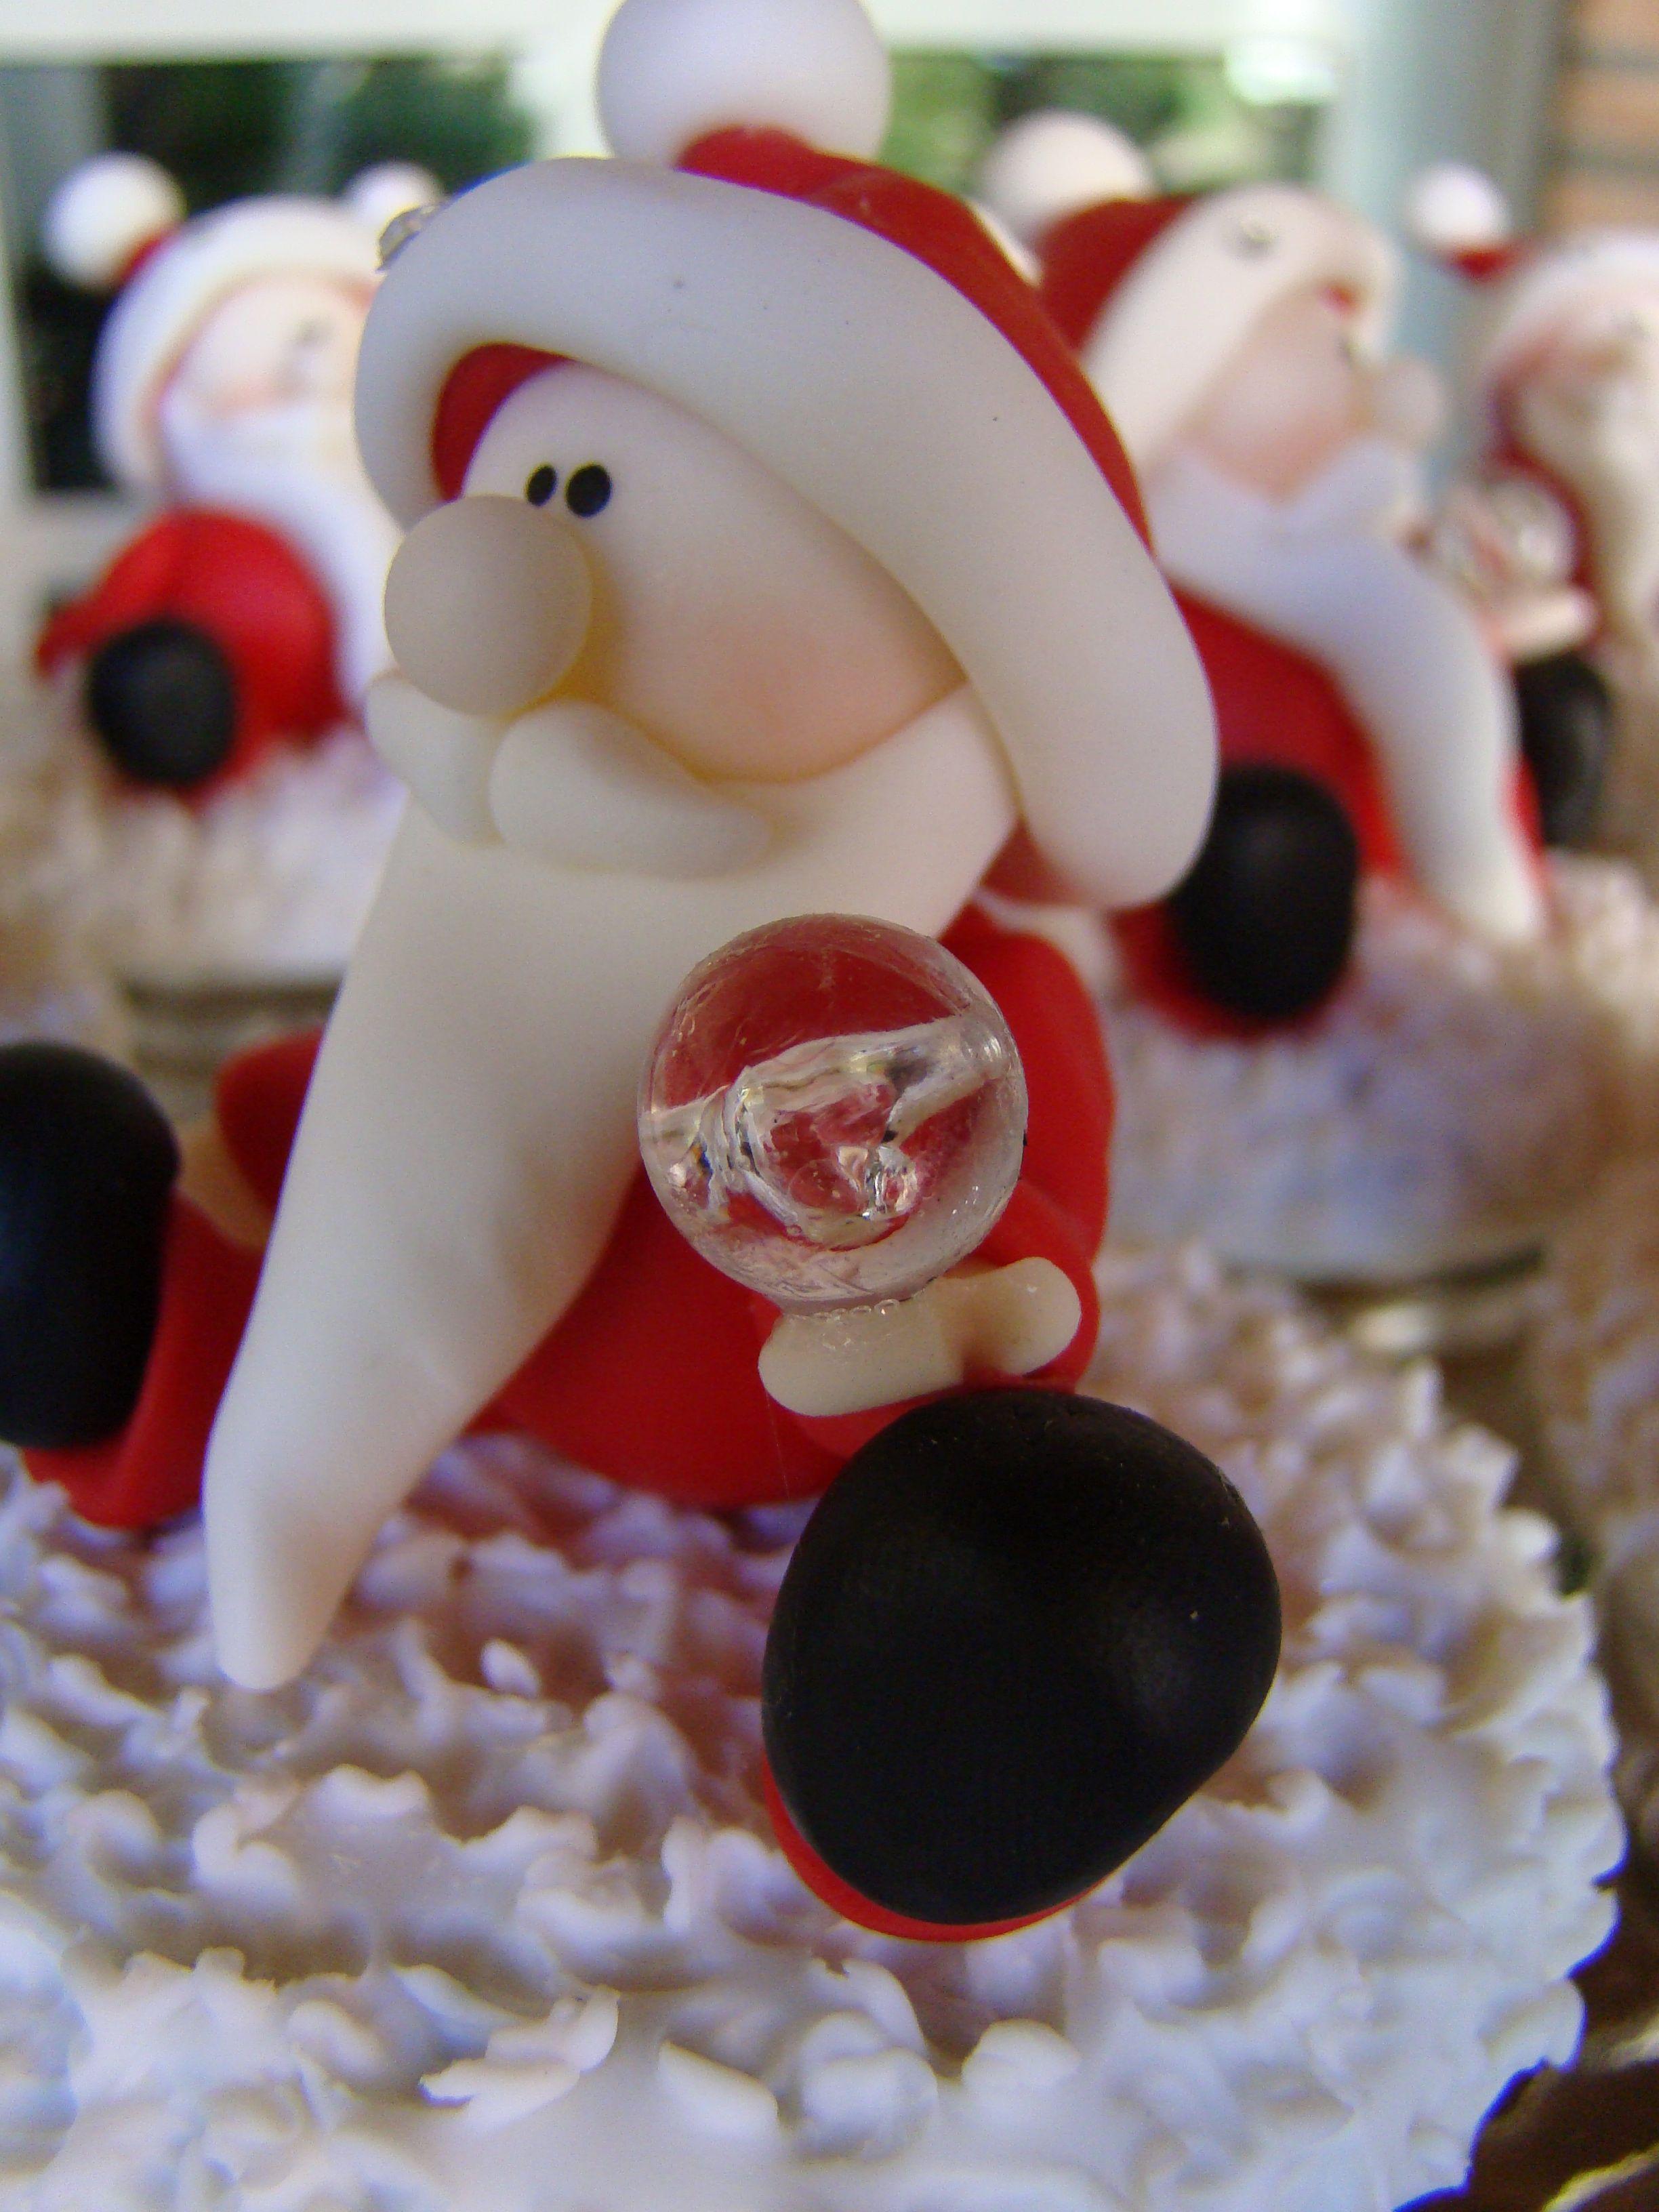 Papa noel porcelana fria navidad en porcelana fria for Adornos navidenos en porcelana fria utilisima